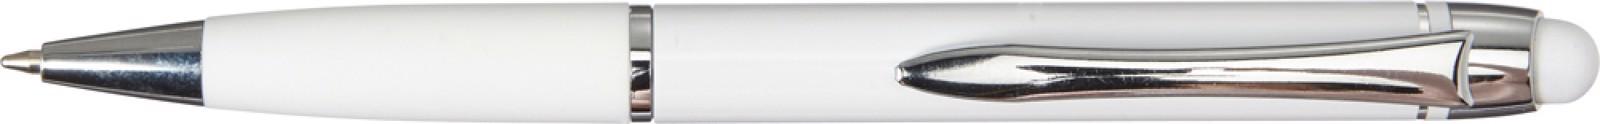 Aluminium ballpen - White